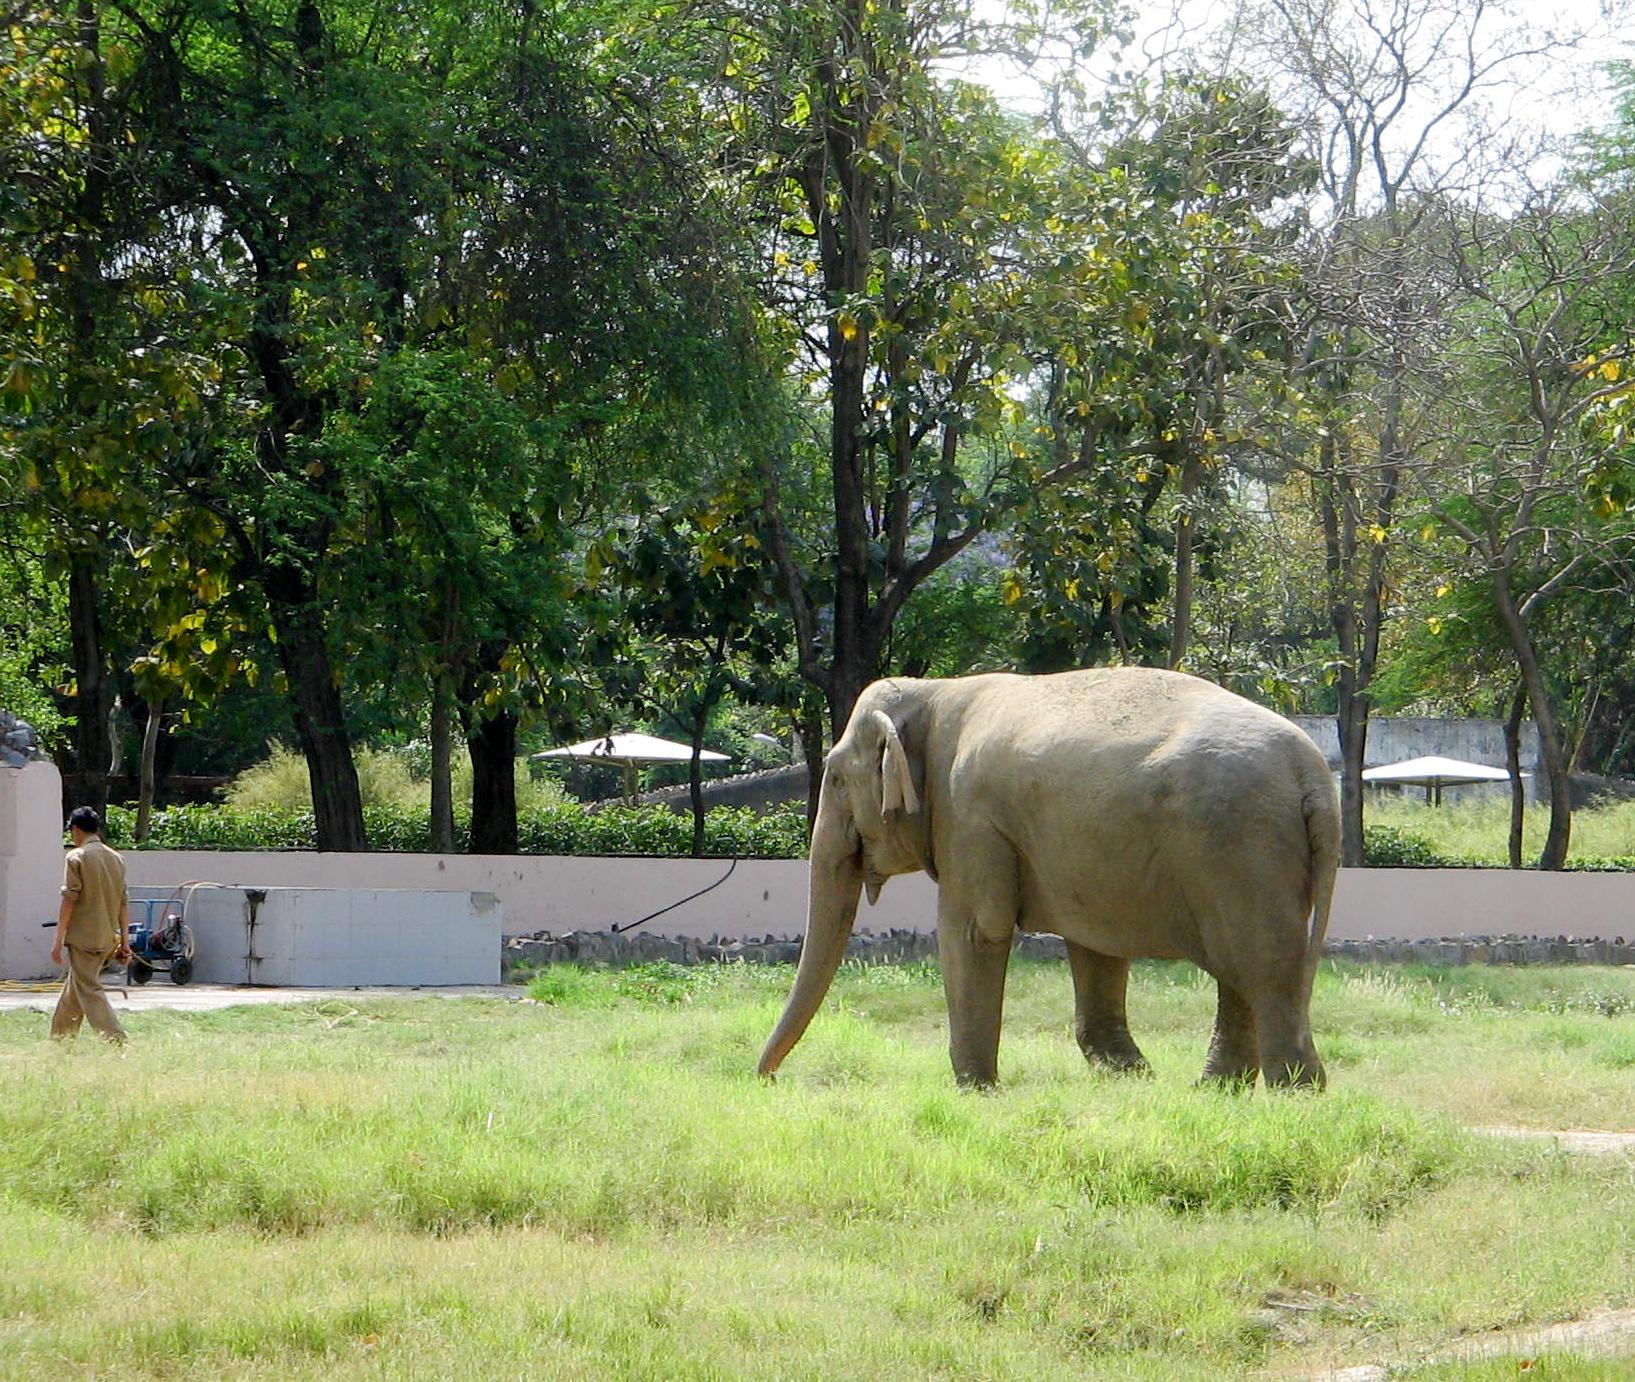 Elephant, Delhi Zoo